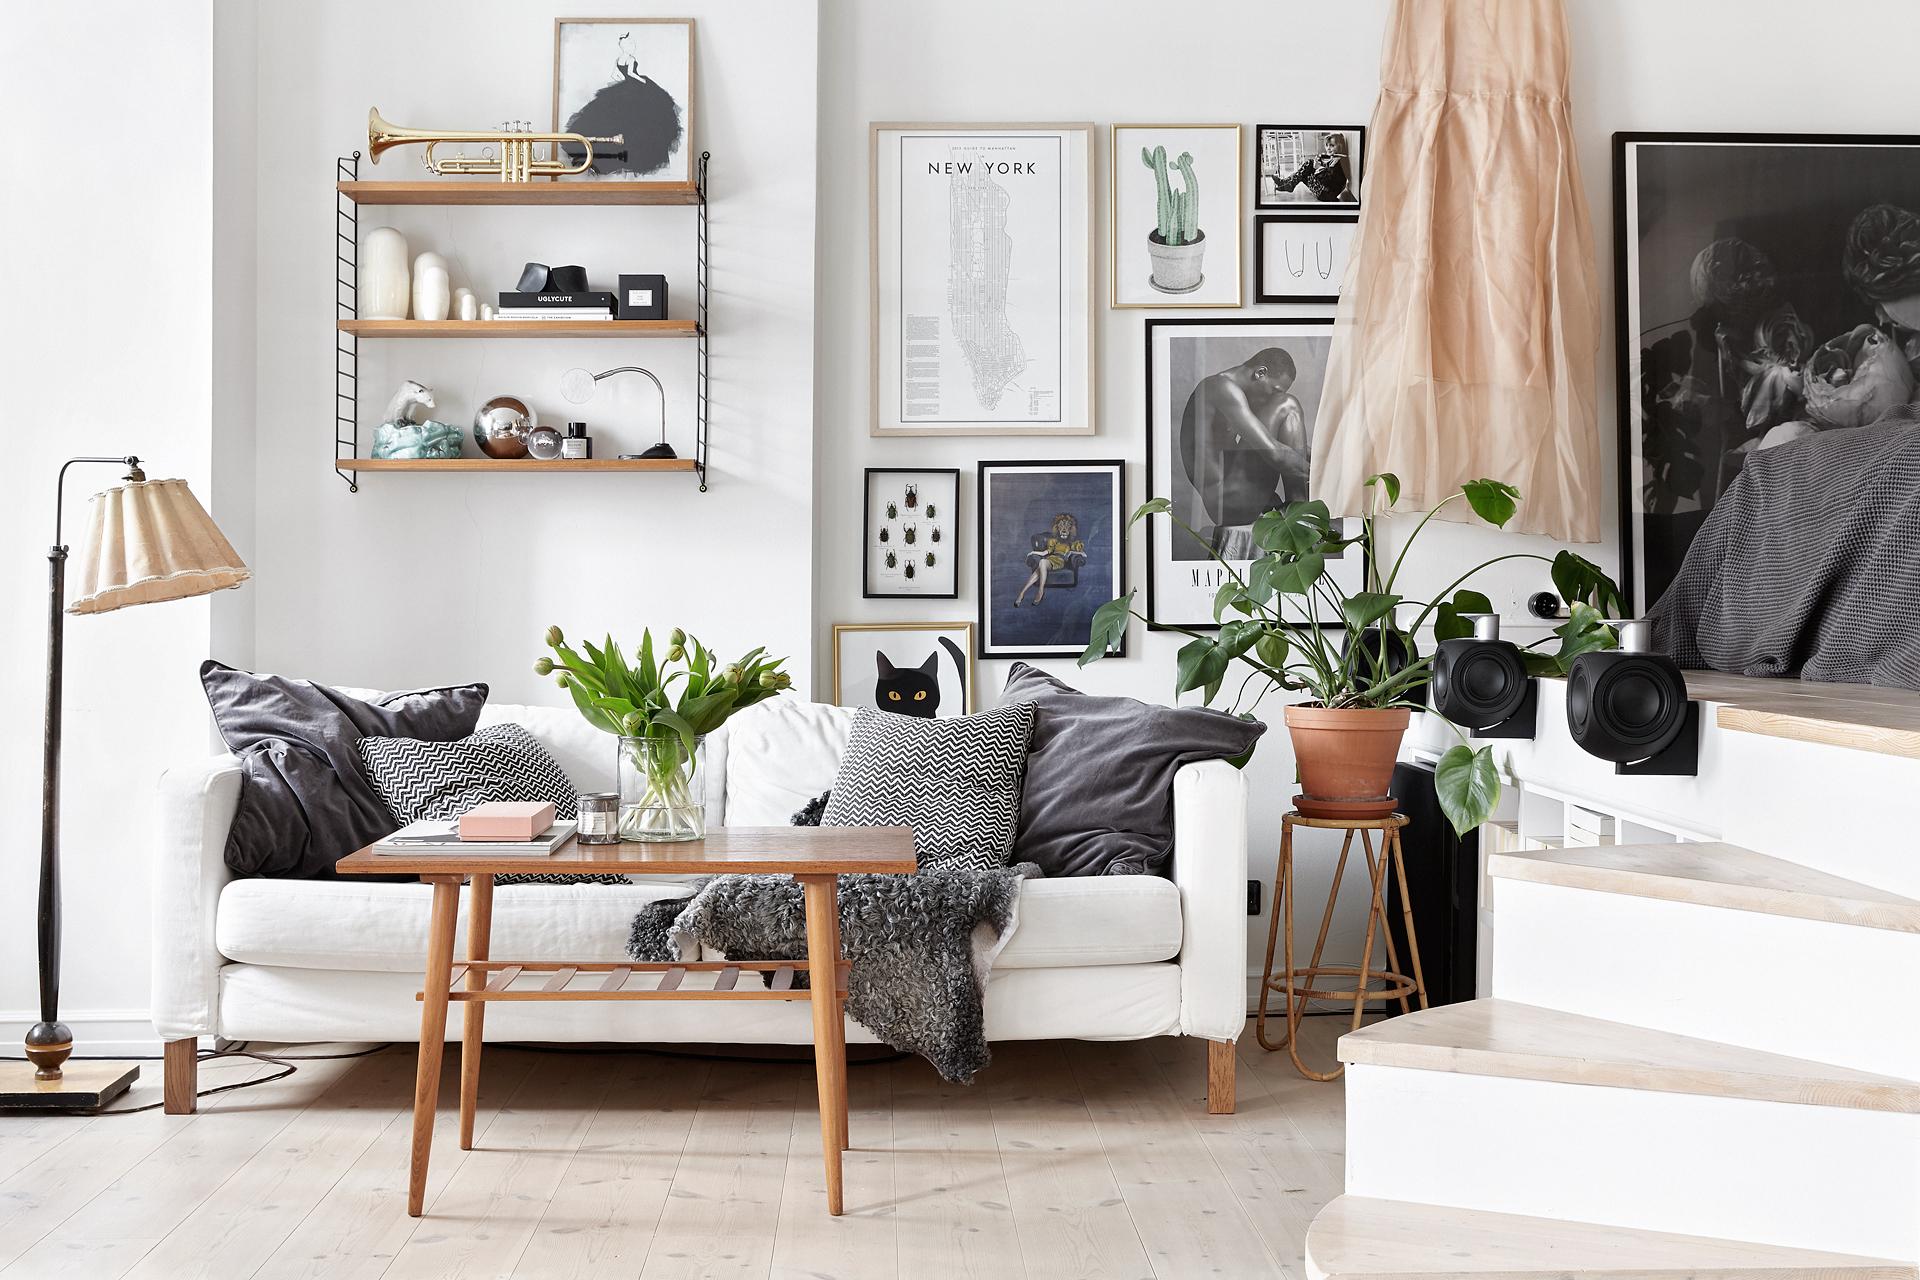 Однокомнатная квартира в скандинавском стиле с картинами